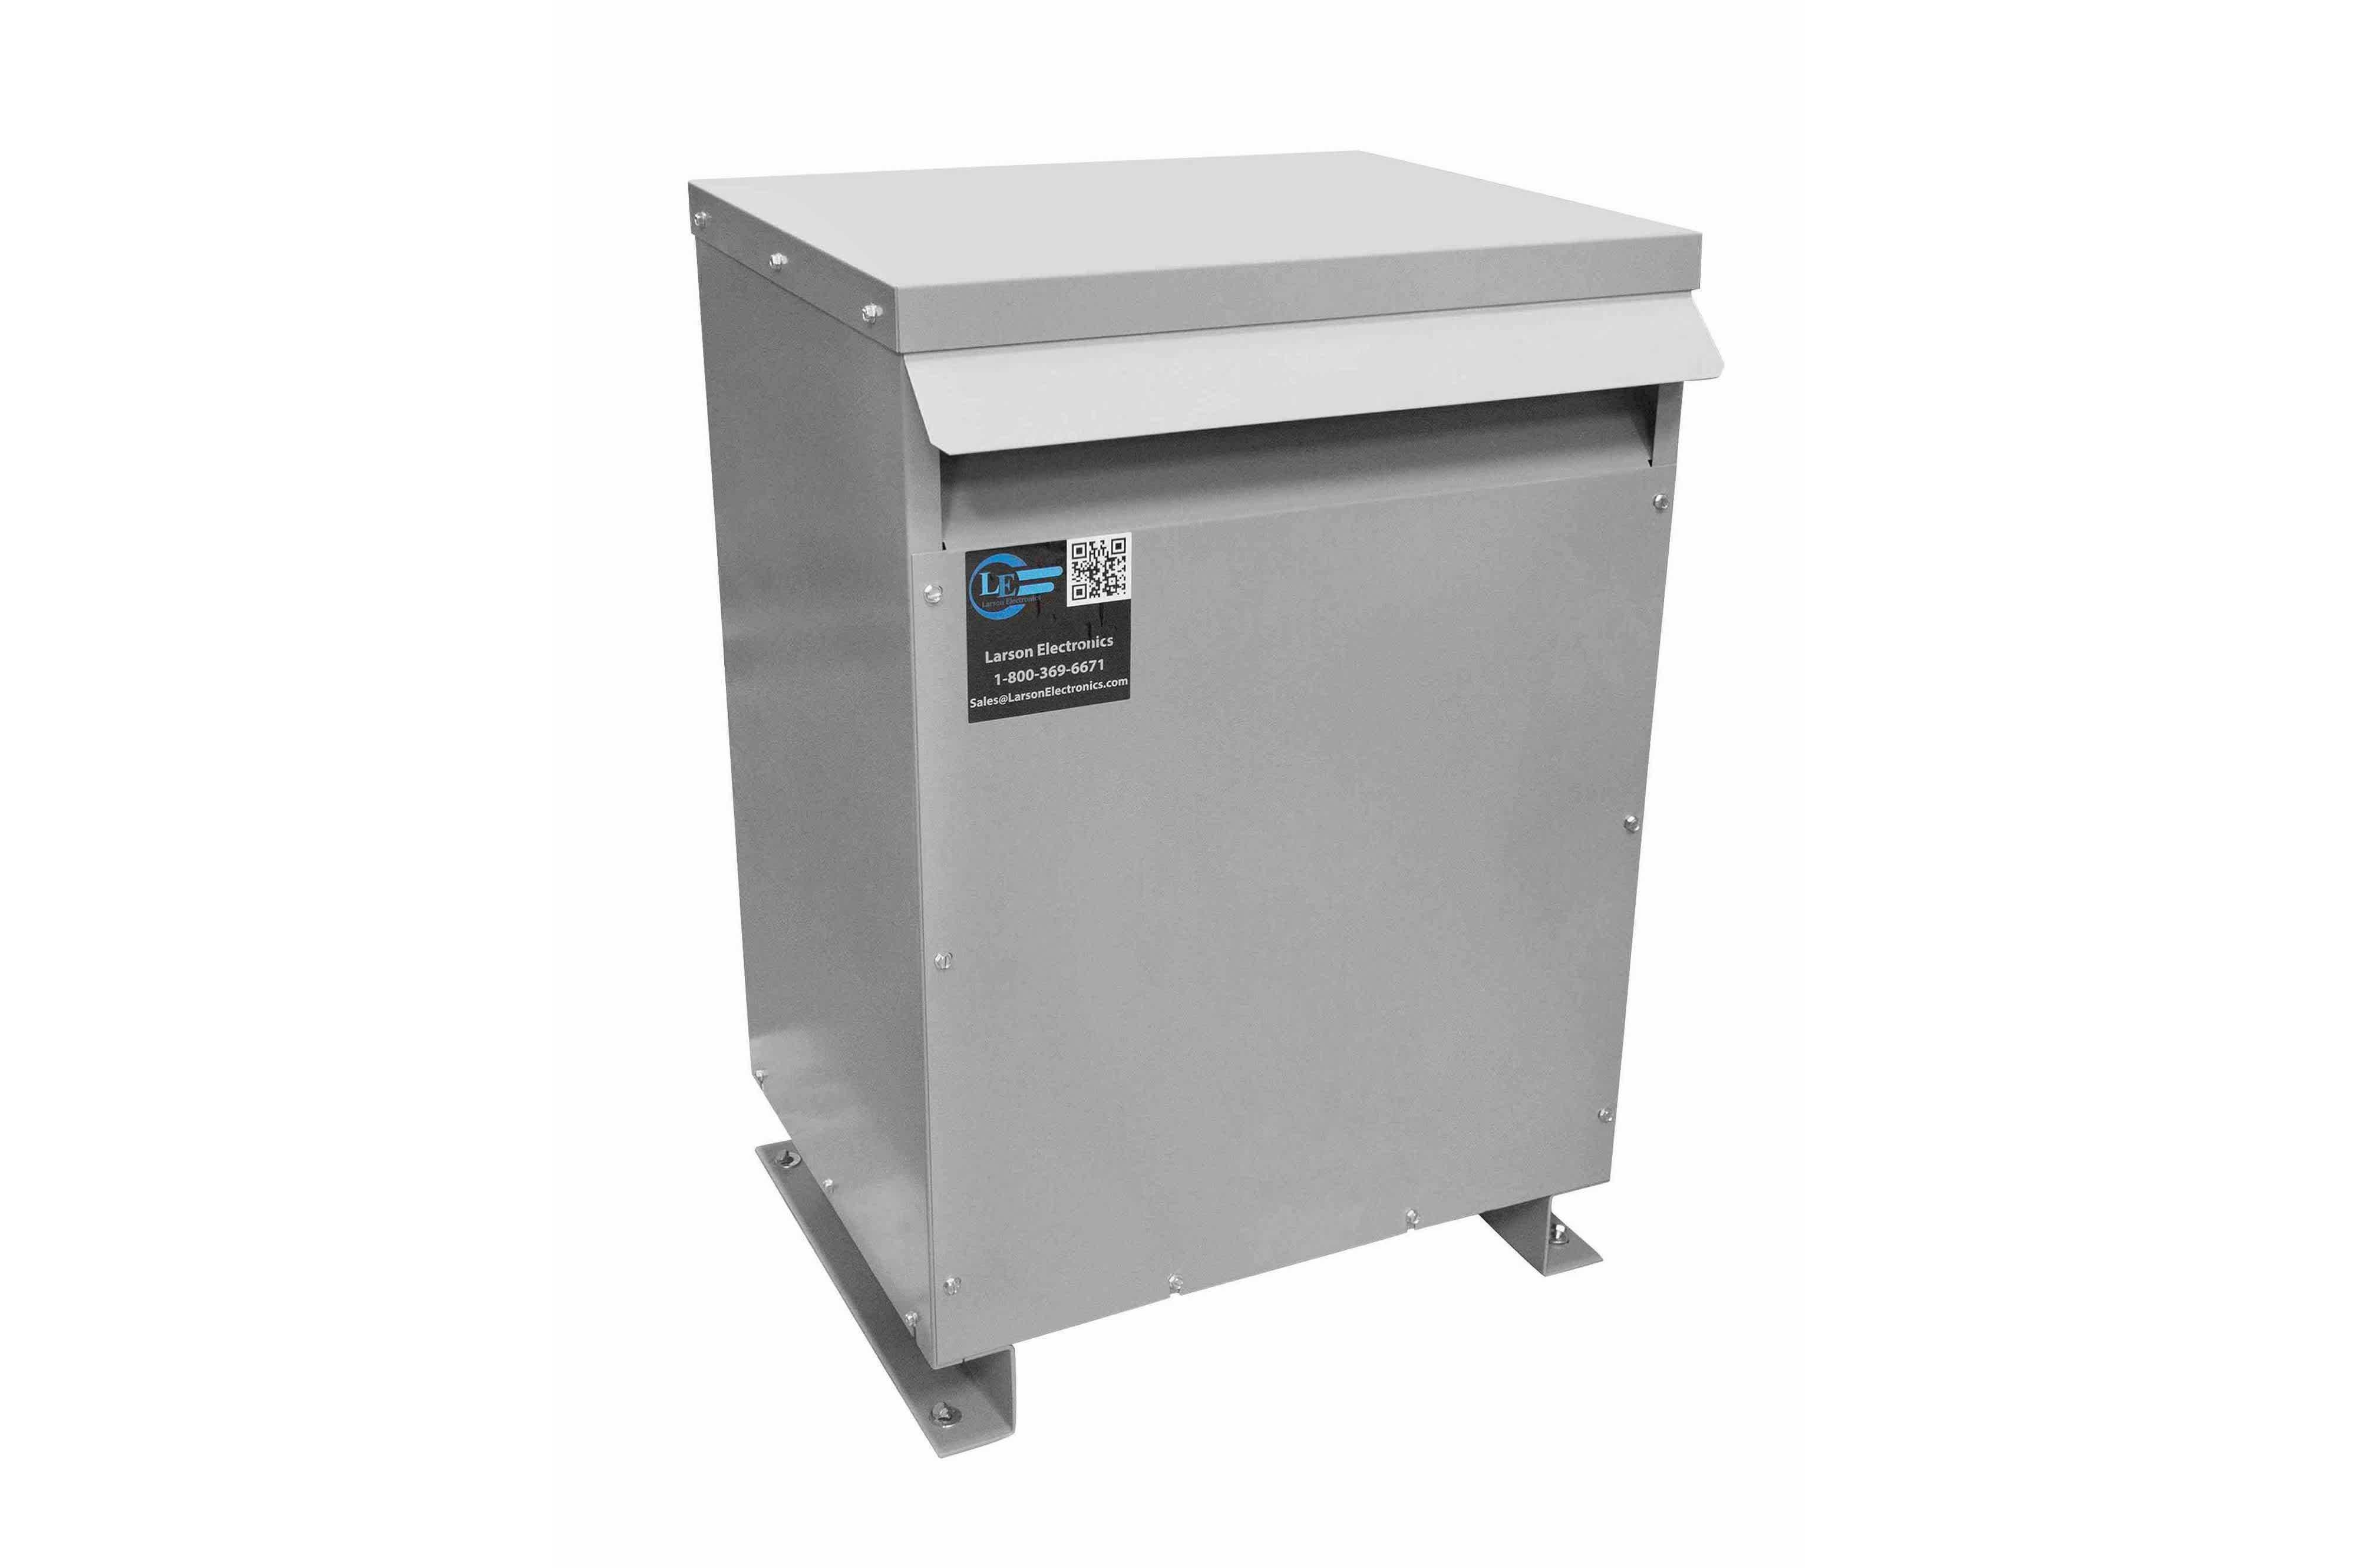 112.5 kVA 3PH DOE Transformer, 240V Delta Primary, 208Y/120 Wye-N Secondary, N3R, Ventilated, 60 Hz